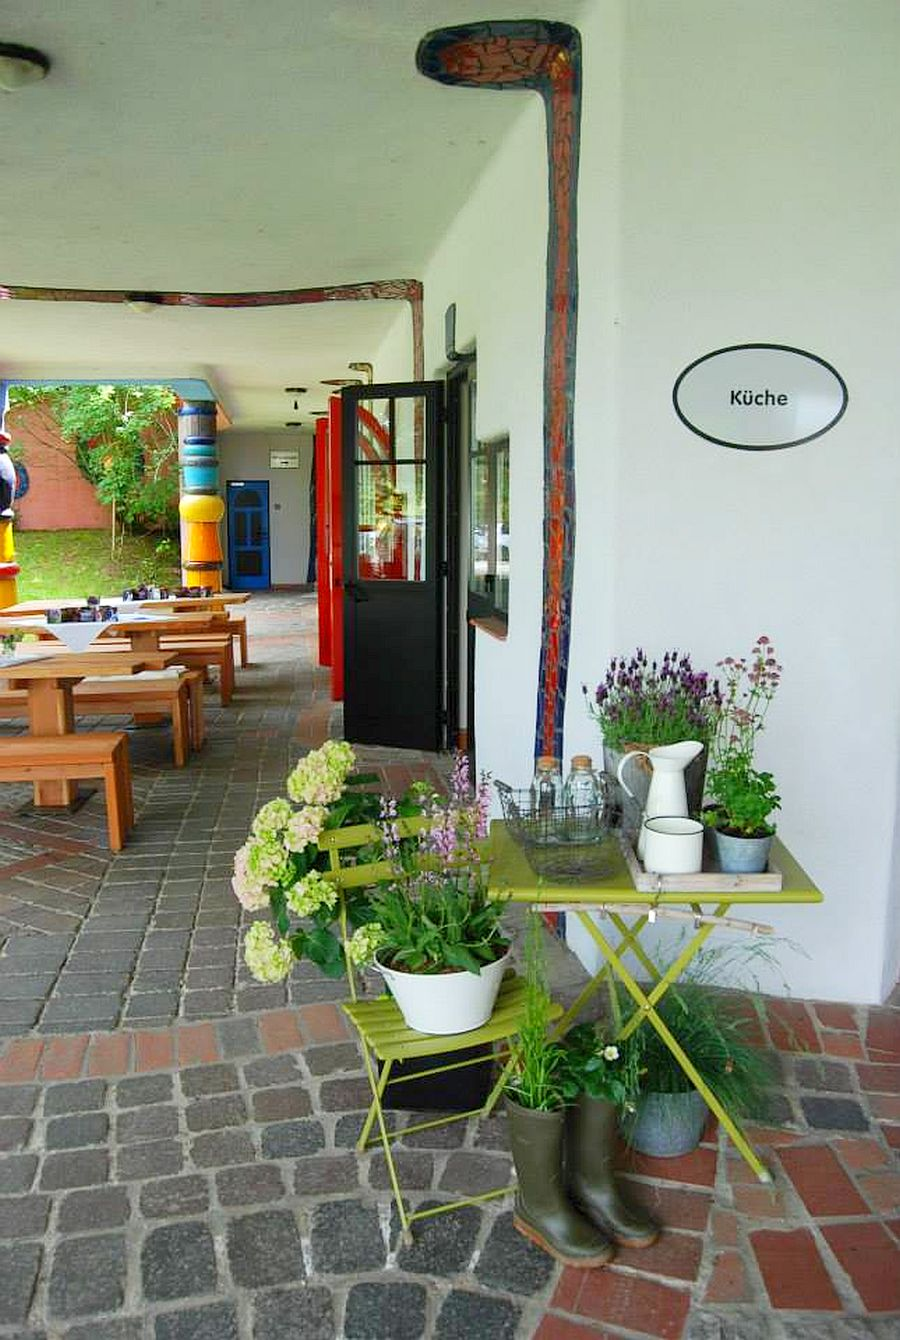 adelaparvu.com despre statiunea Rogner Bad Blumau, Austria, arhitect Friedensreich Hundertwasser (21)